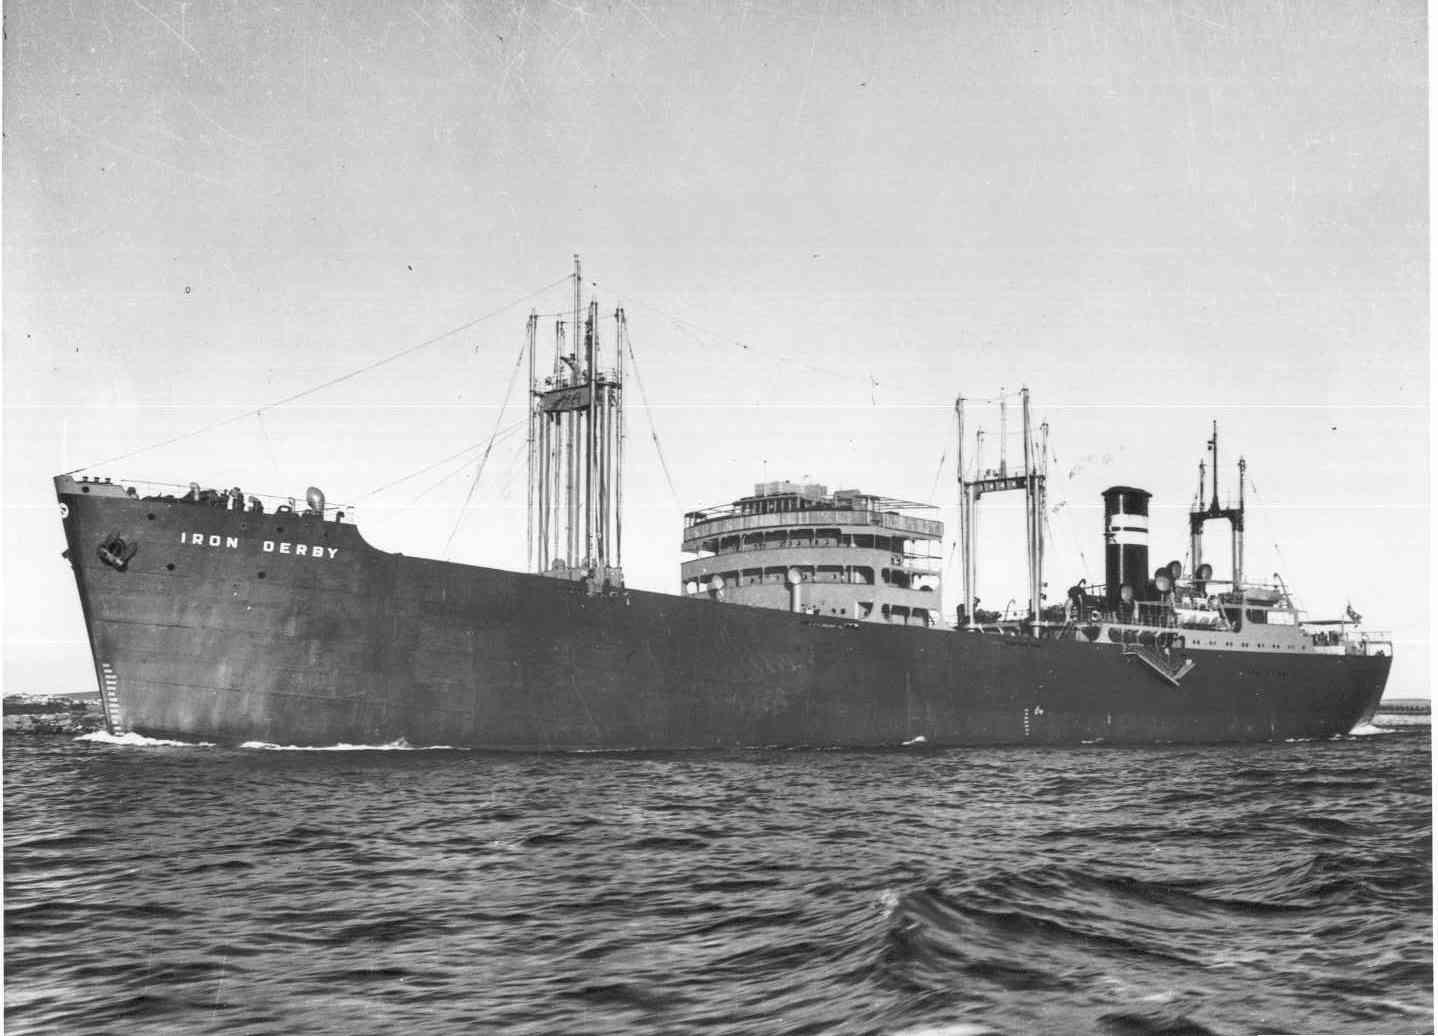 1951 General cargo vessel